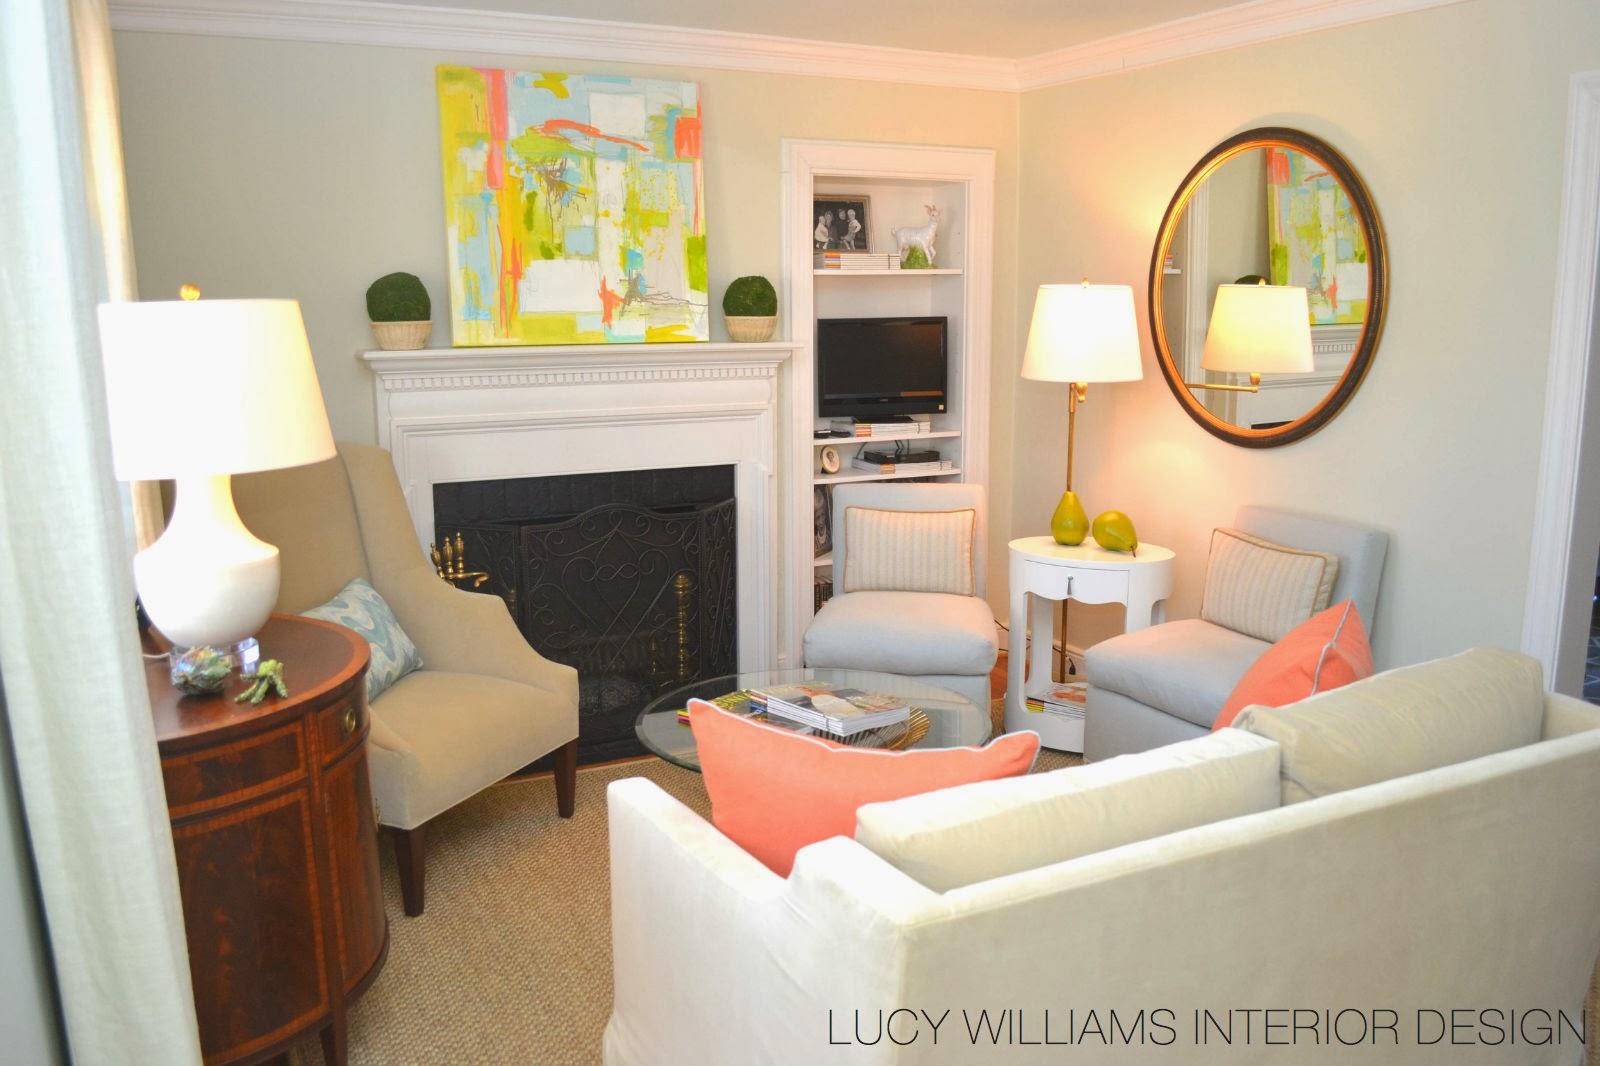 Lucy williams interior design blog february 2014 for Lucy williams interiors